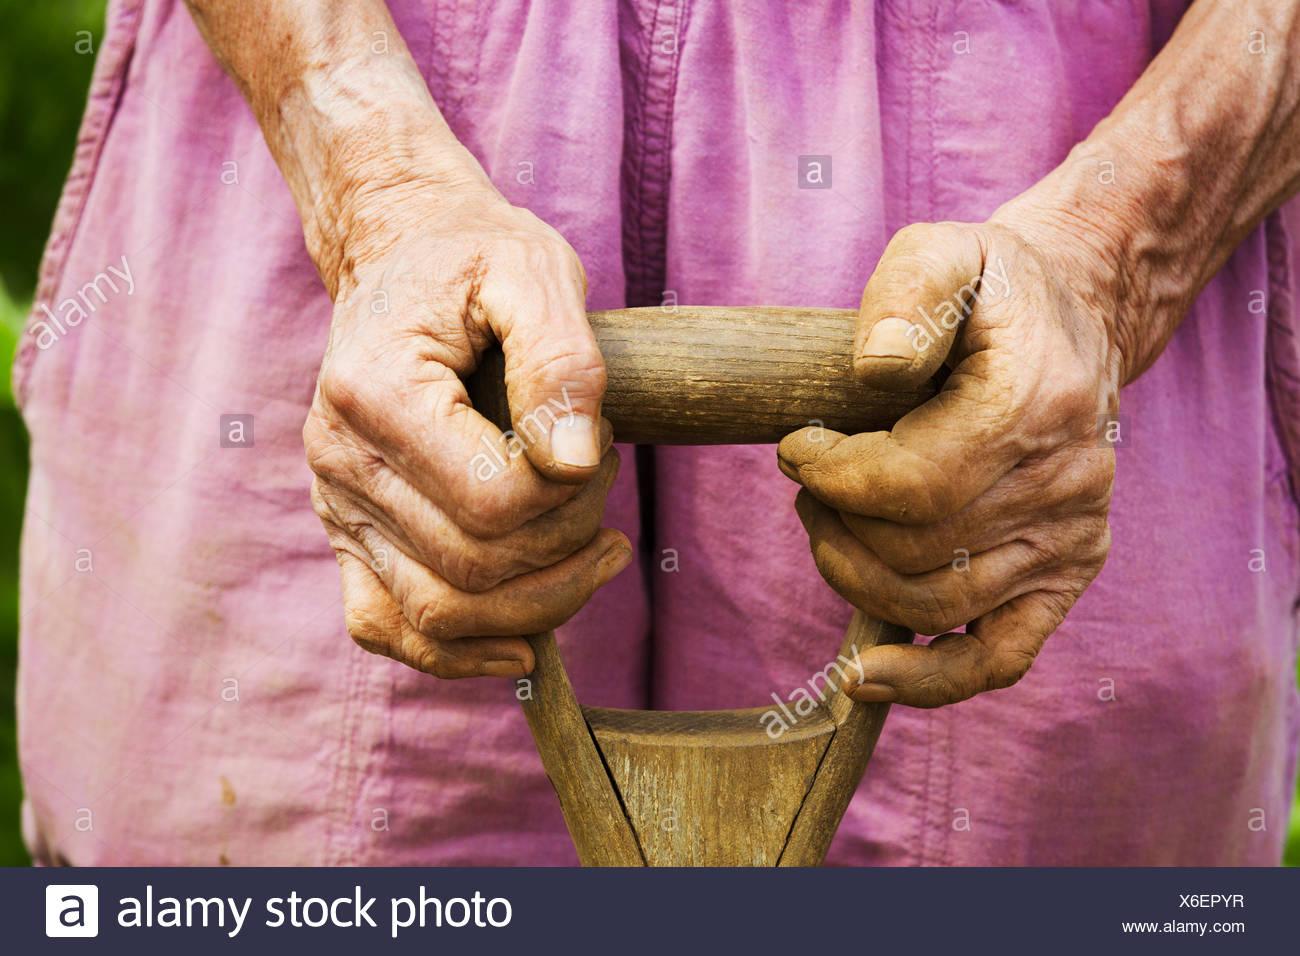 A woman holding a shovel on a farm. - Stock Image